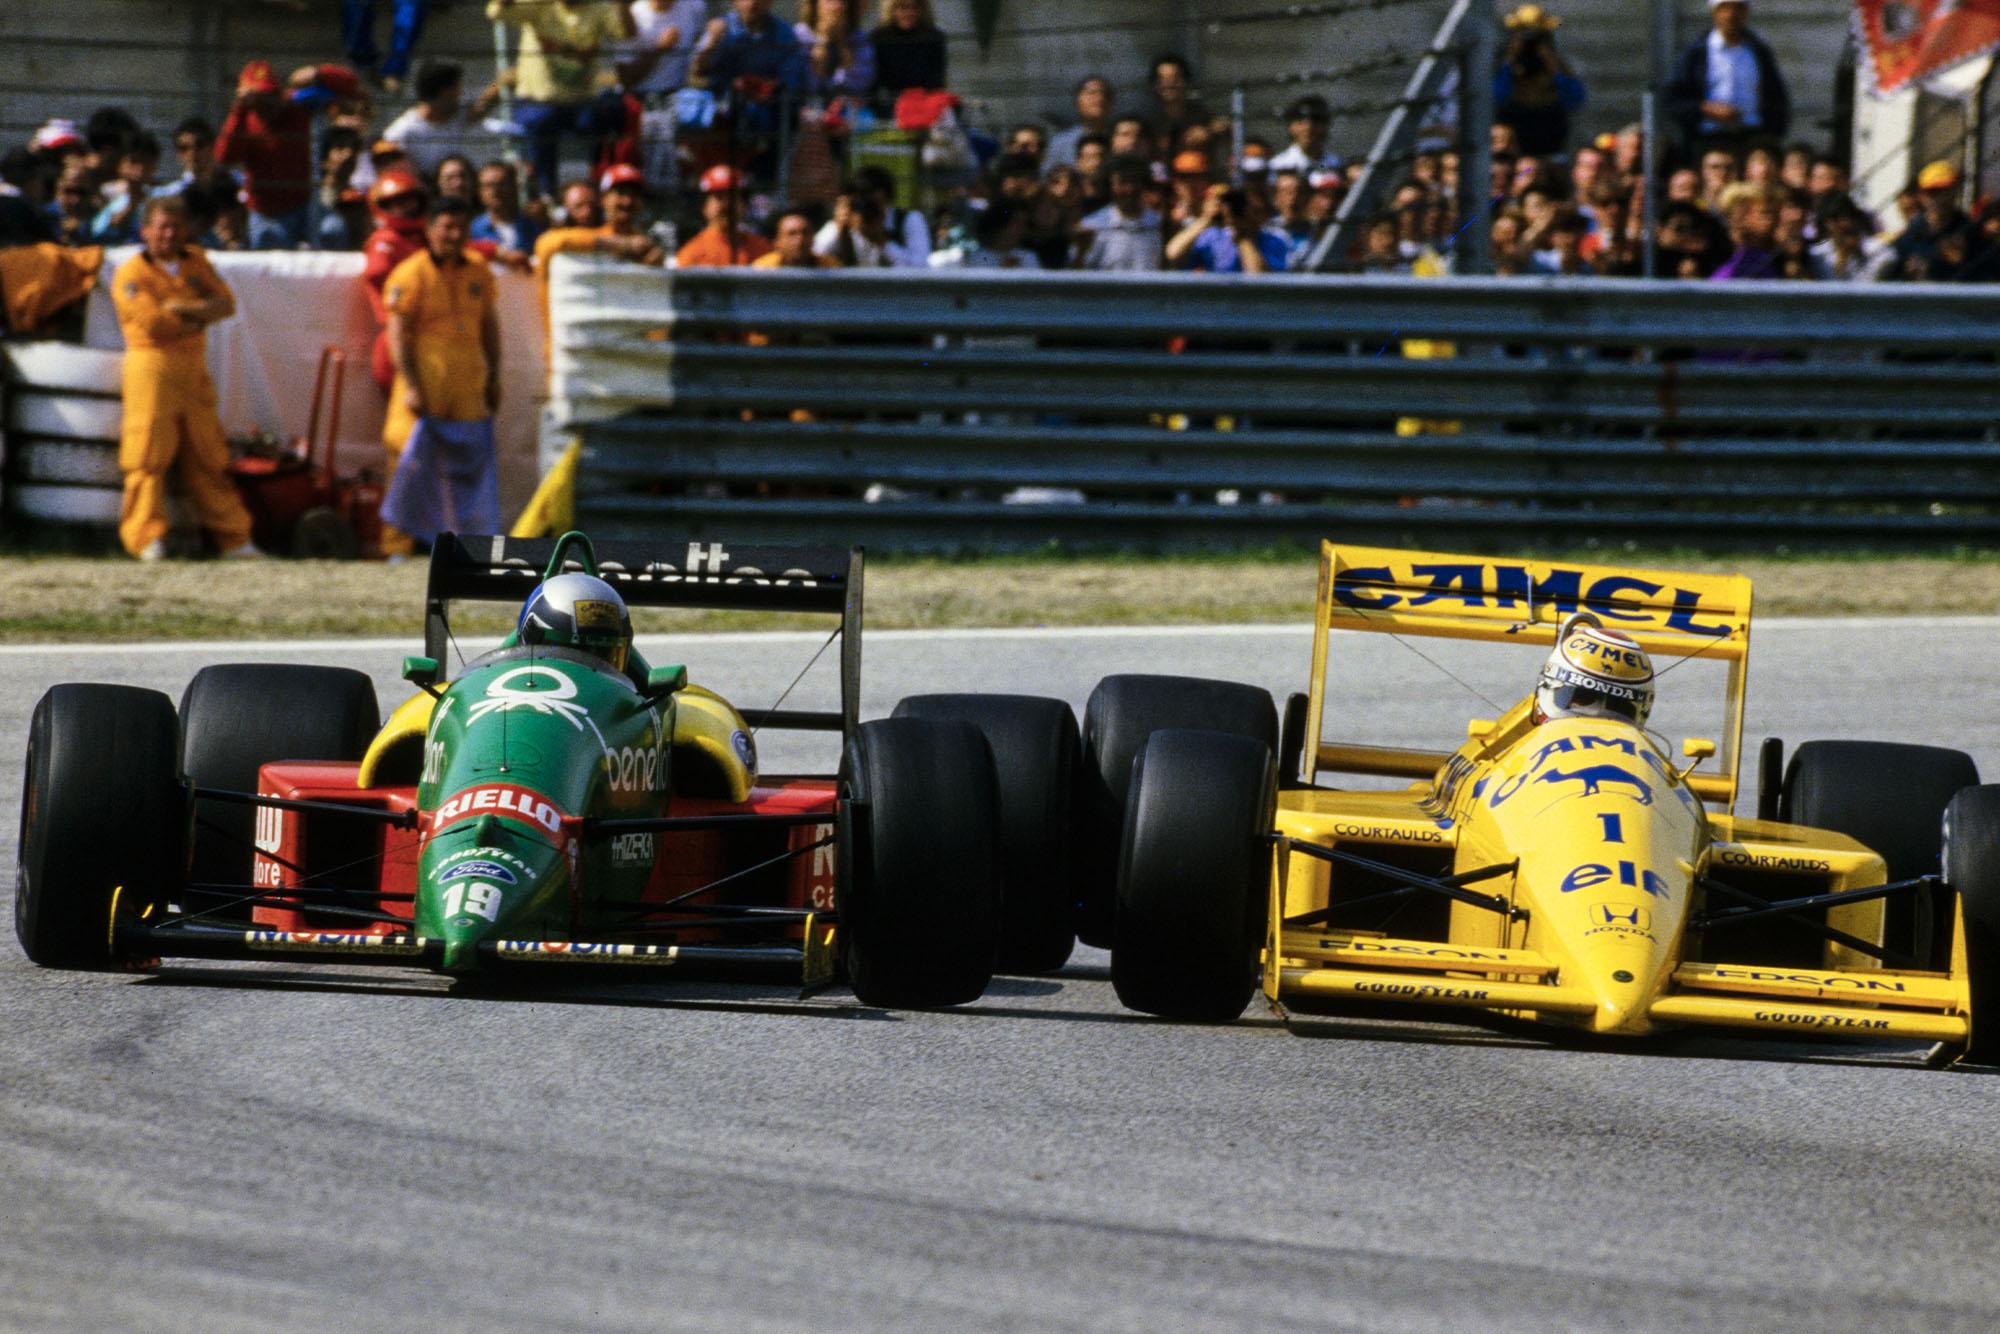 1988 SAN GP battle 2